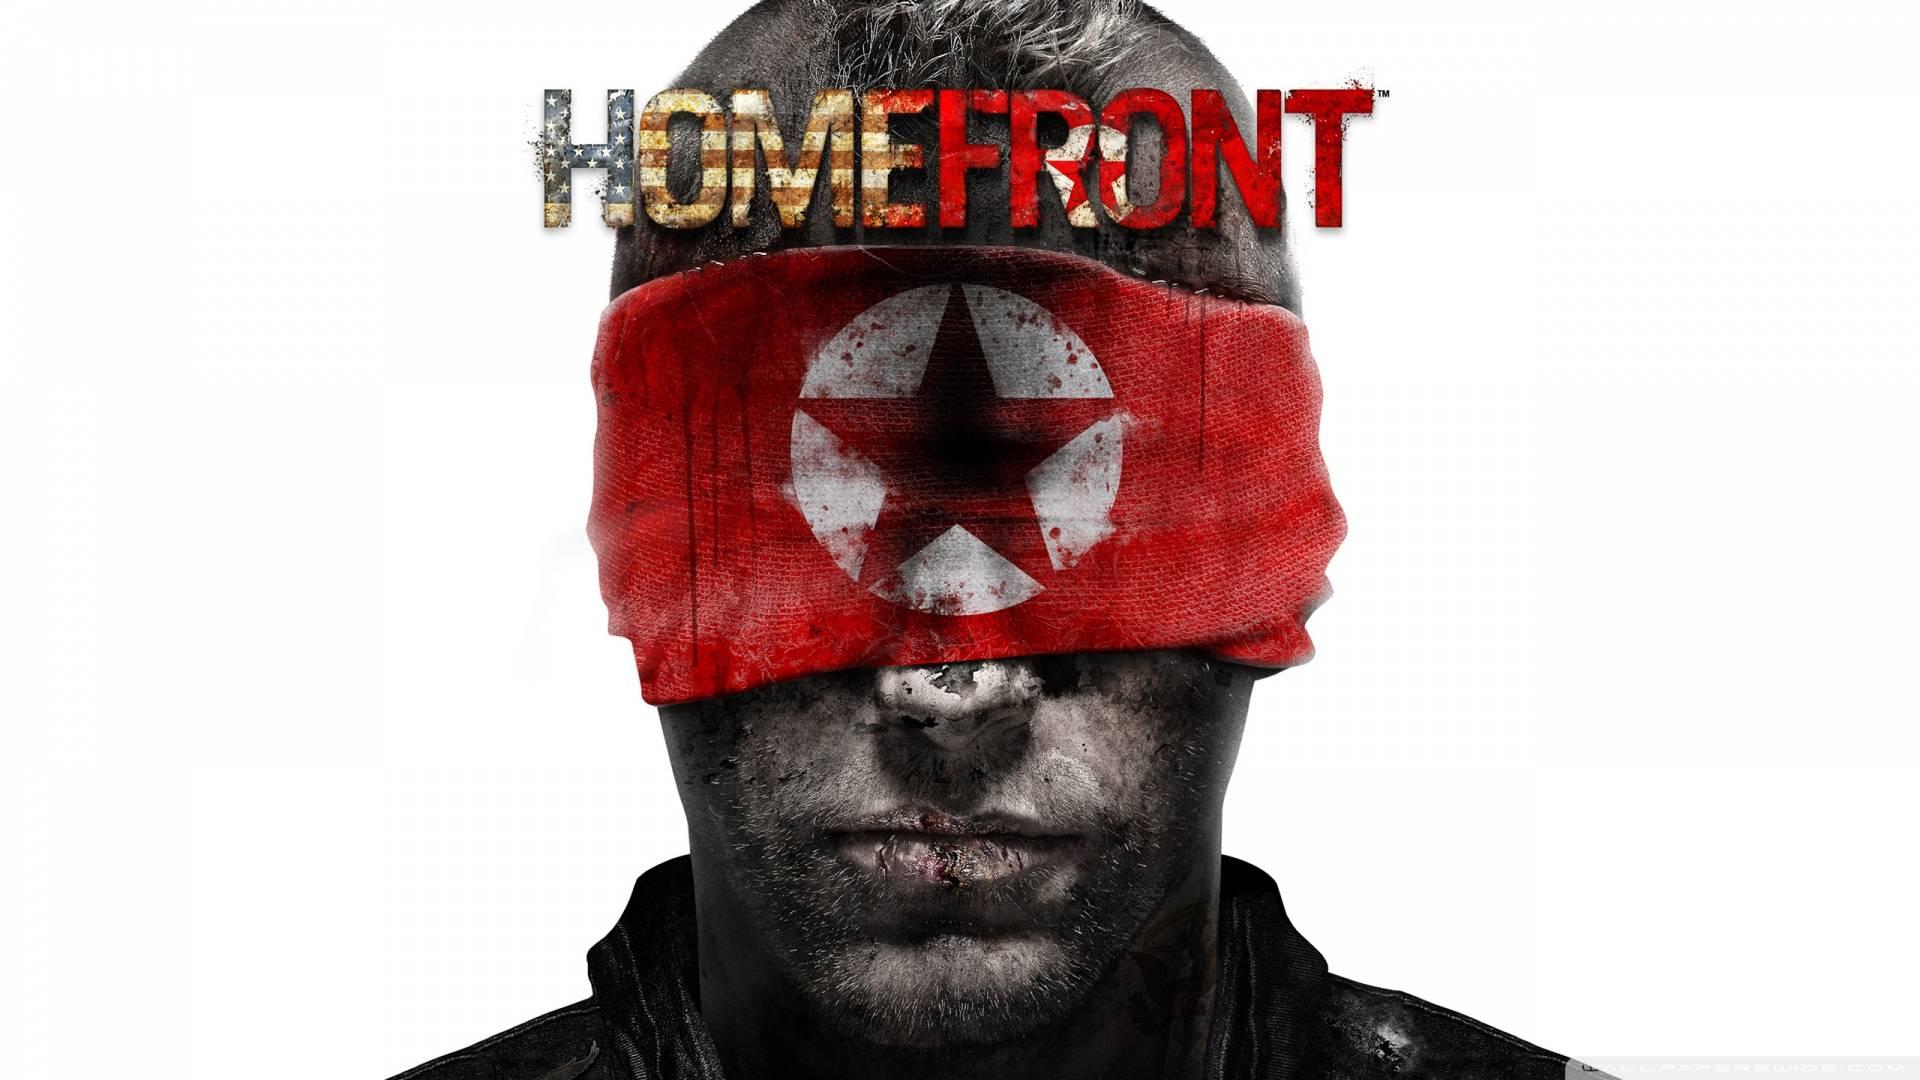 Homefront Wallpaper Hd 1080p Xbox 360